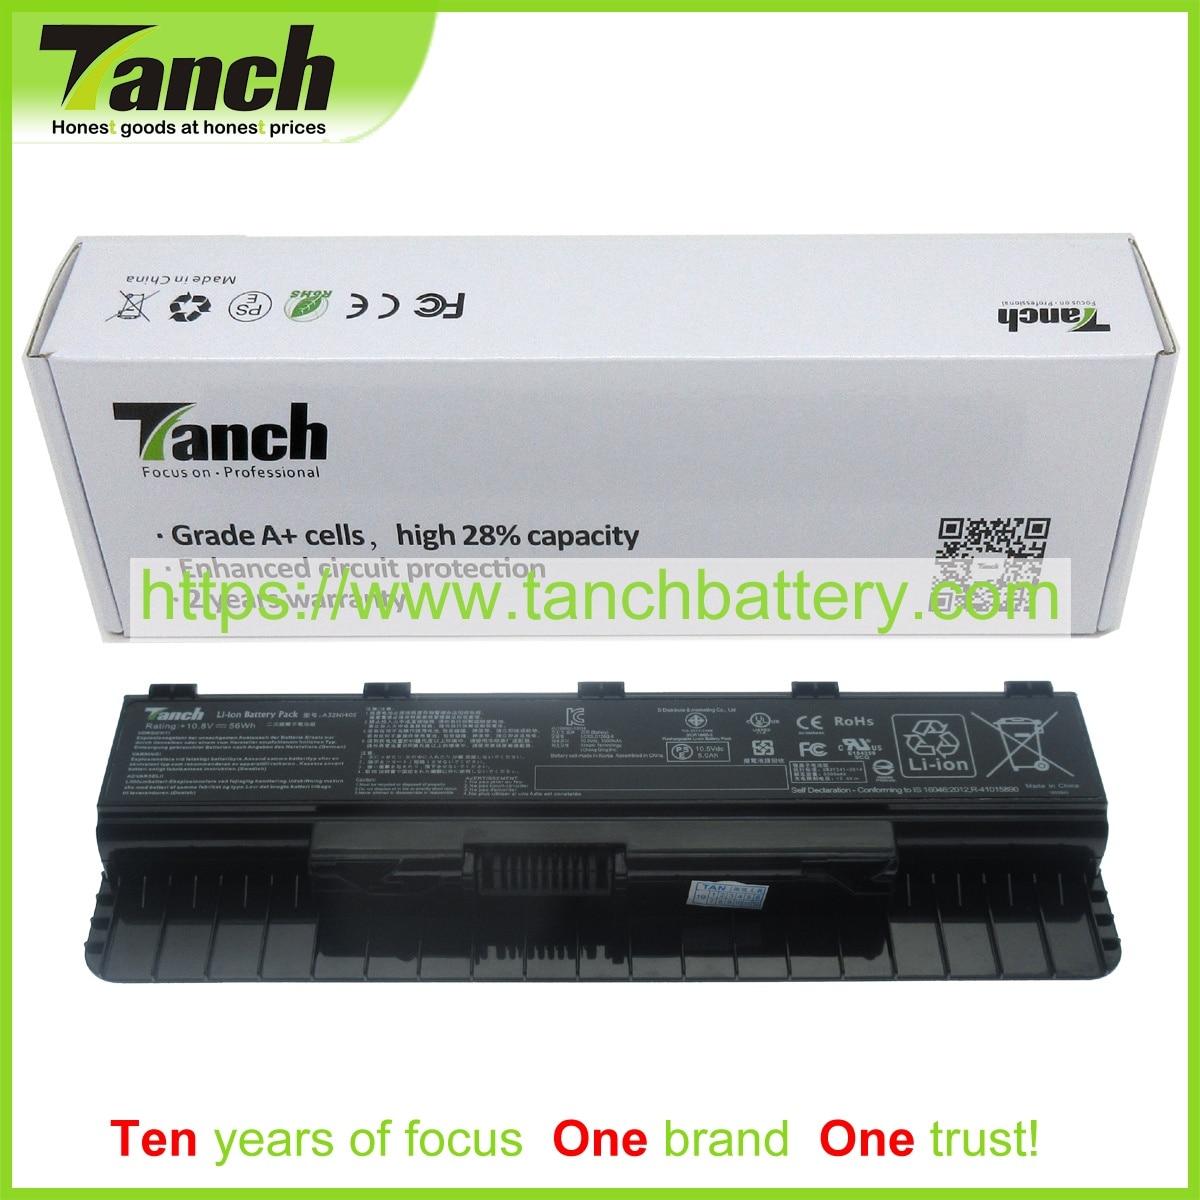 Tanch-بطارية كمبيوتر محمول 6 خلايا ، لـ ASUS G551 ، A32N1405 ، LC32SD128Q ، N551JK ، JX ، VW ، ROG ، G771 ، GL551J ، GL771JW ، JK ، 10.8 فولت